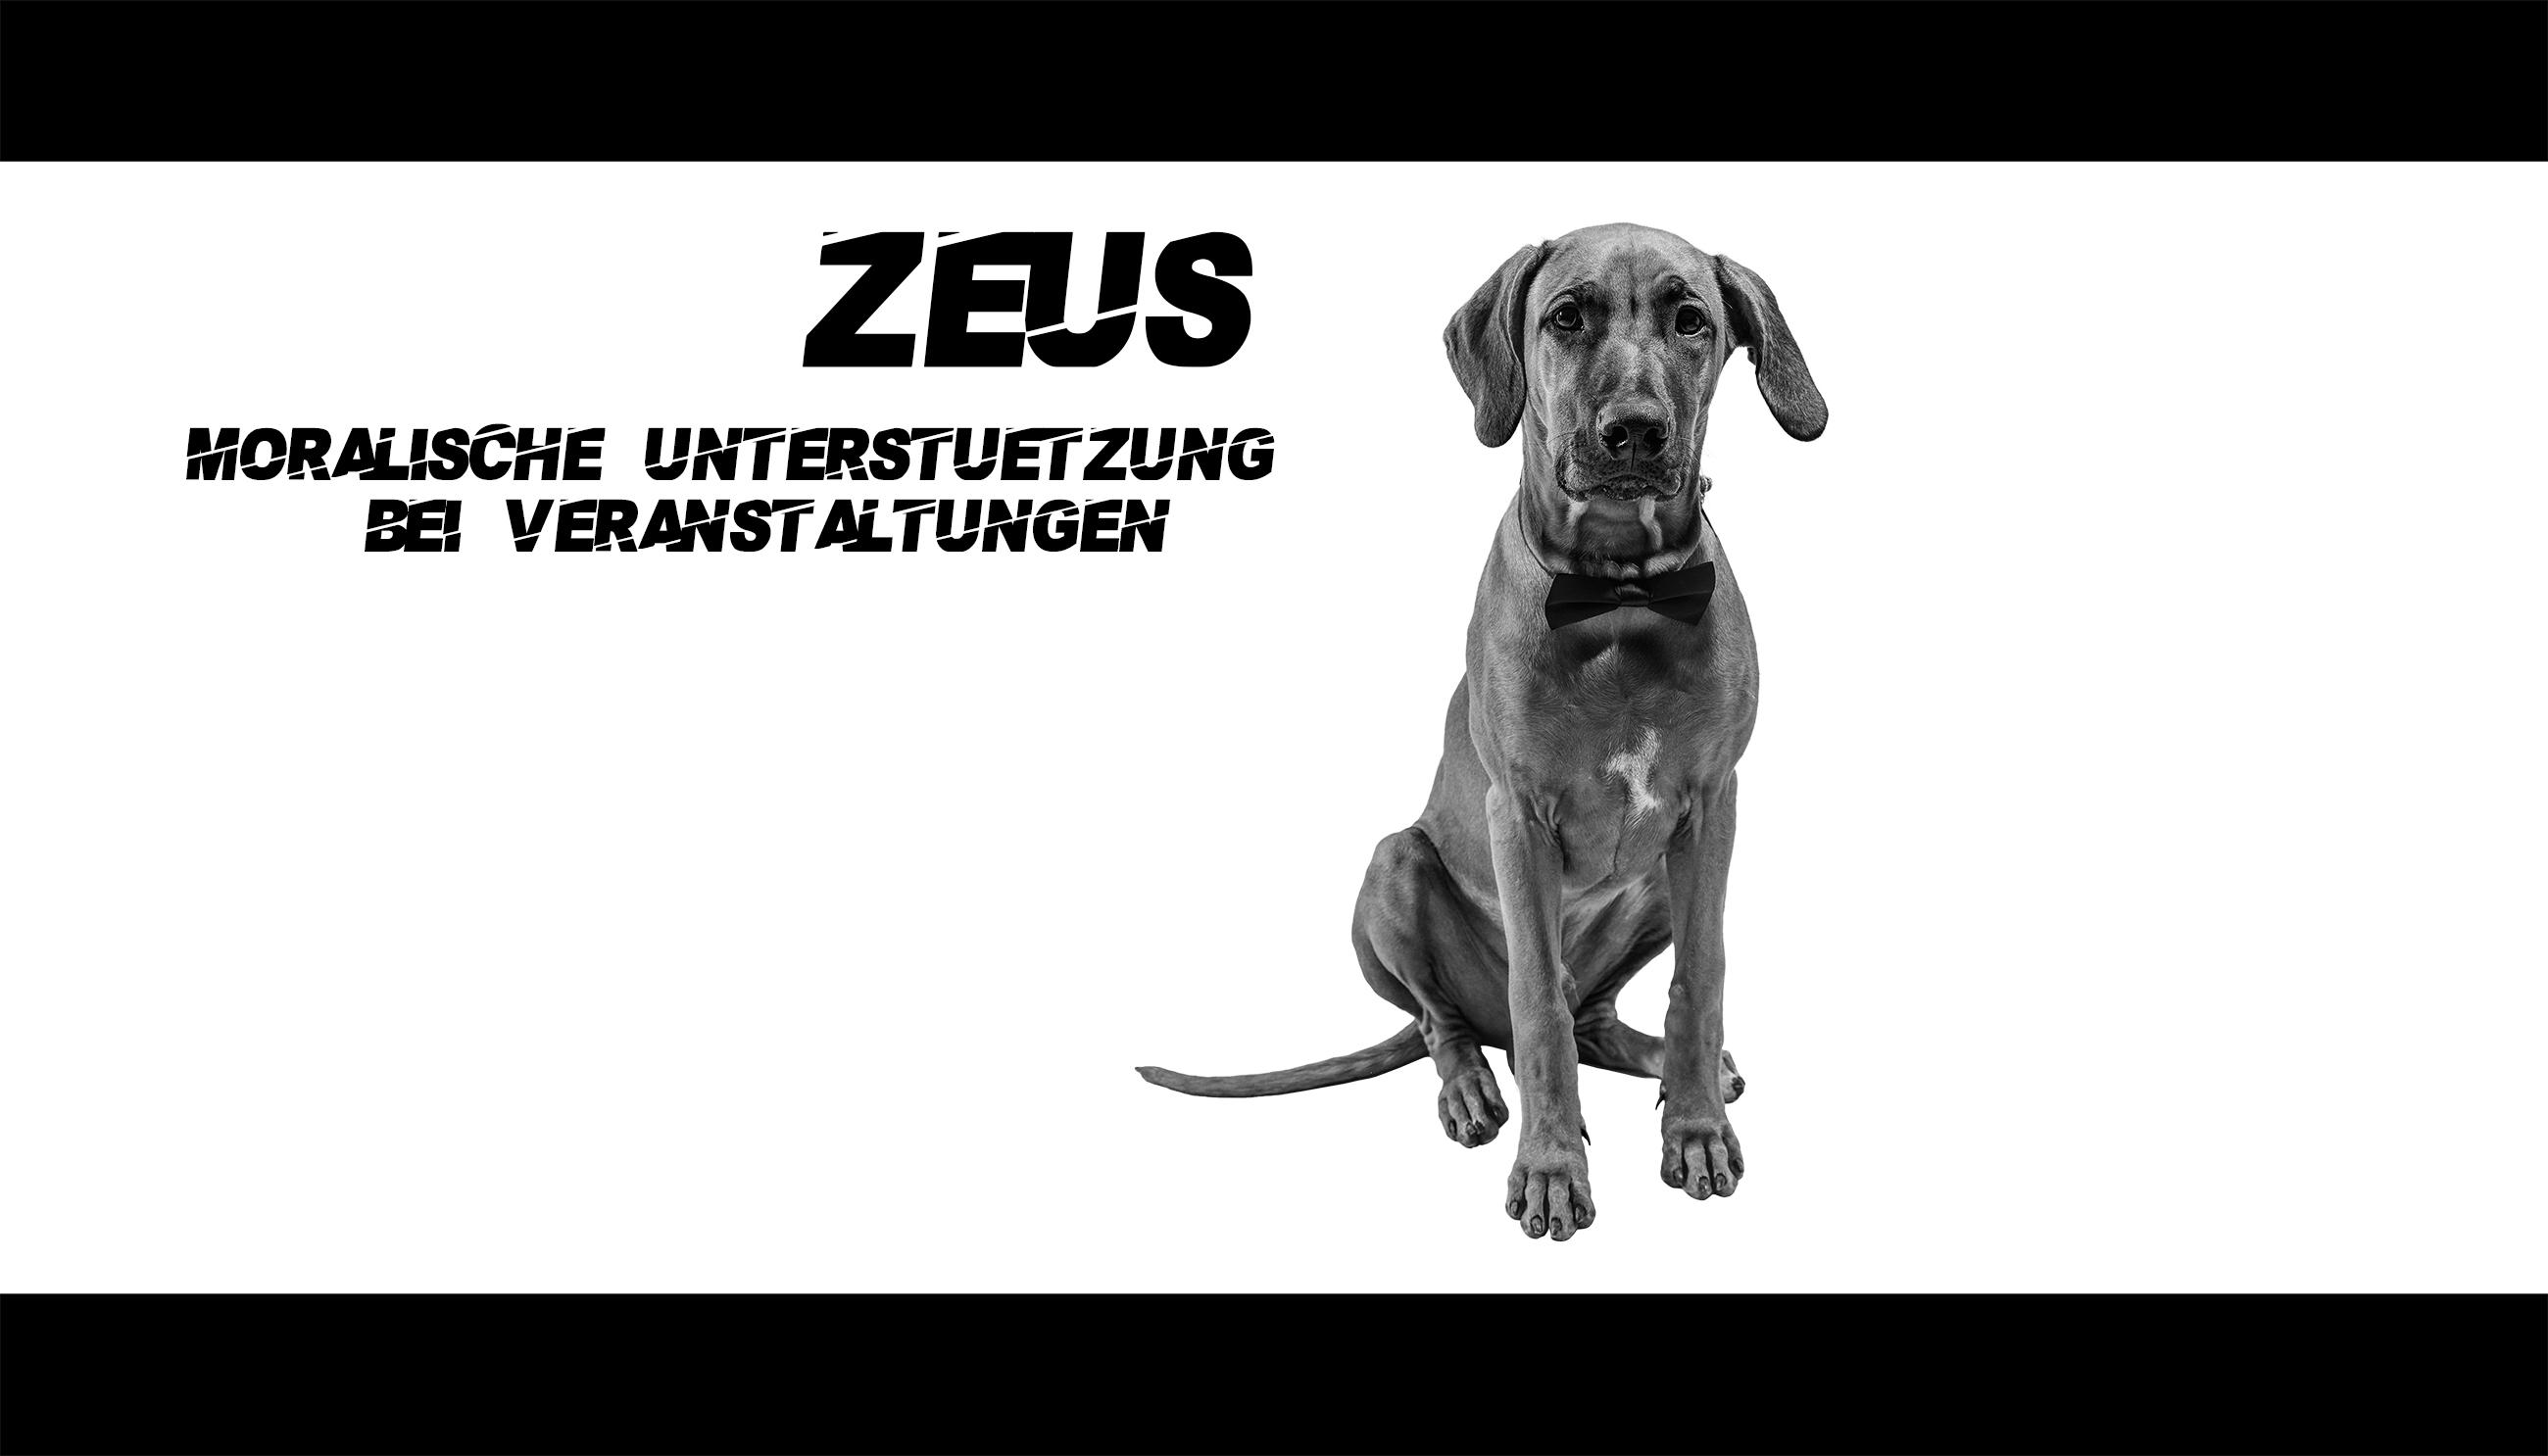 Eventmeister_Zeus_2600